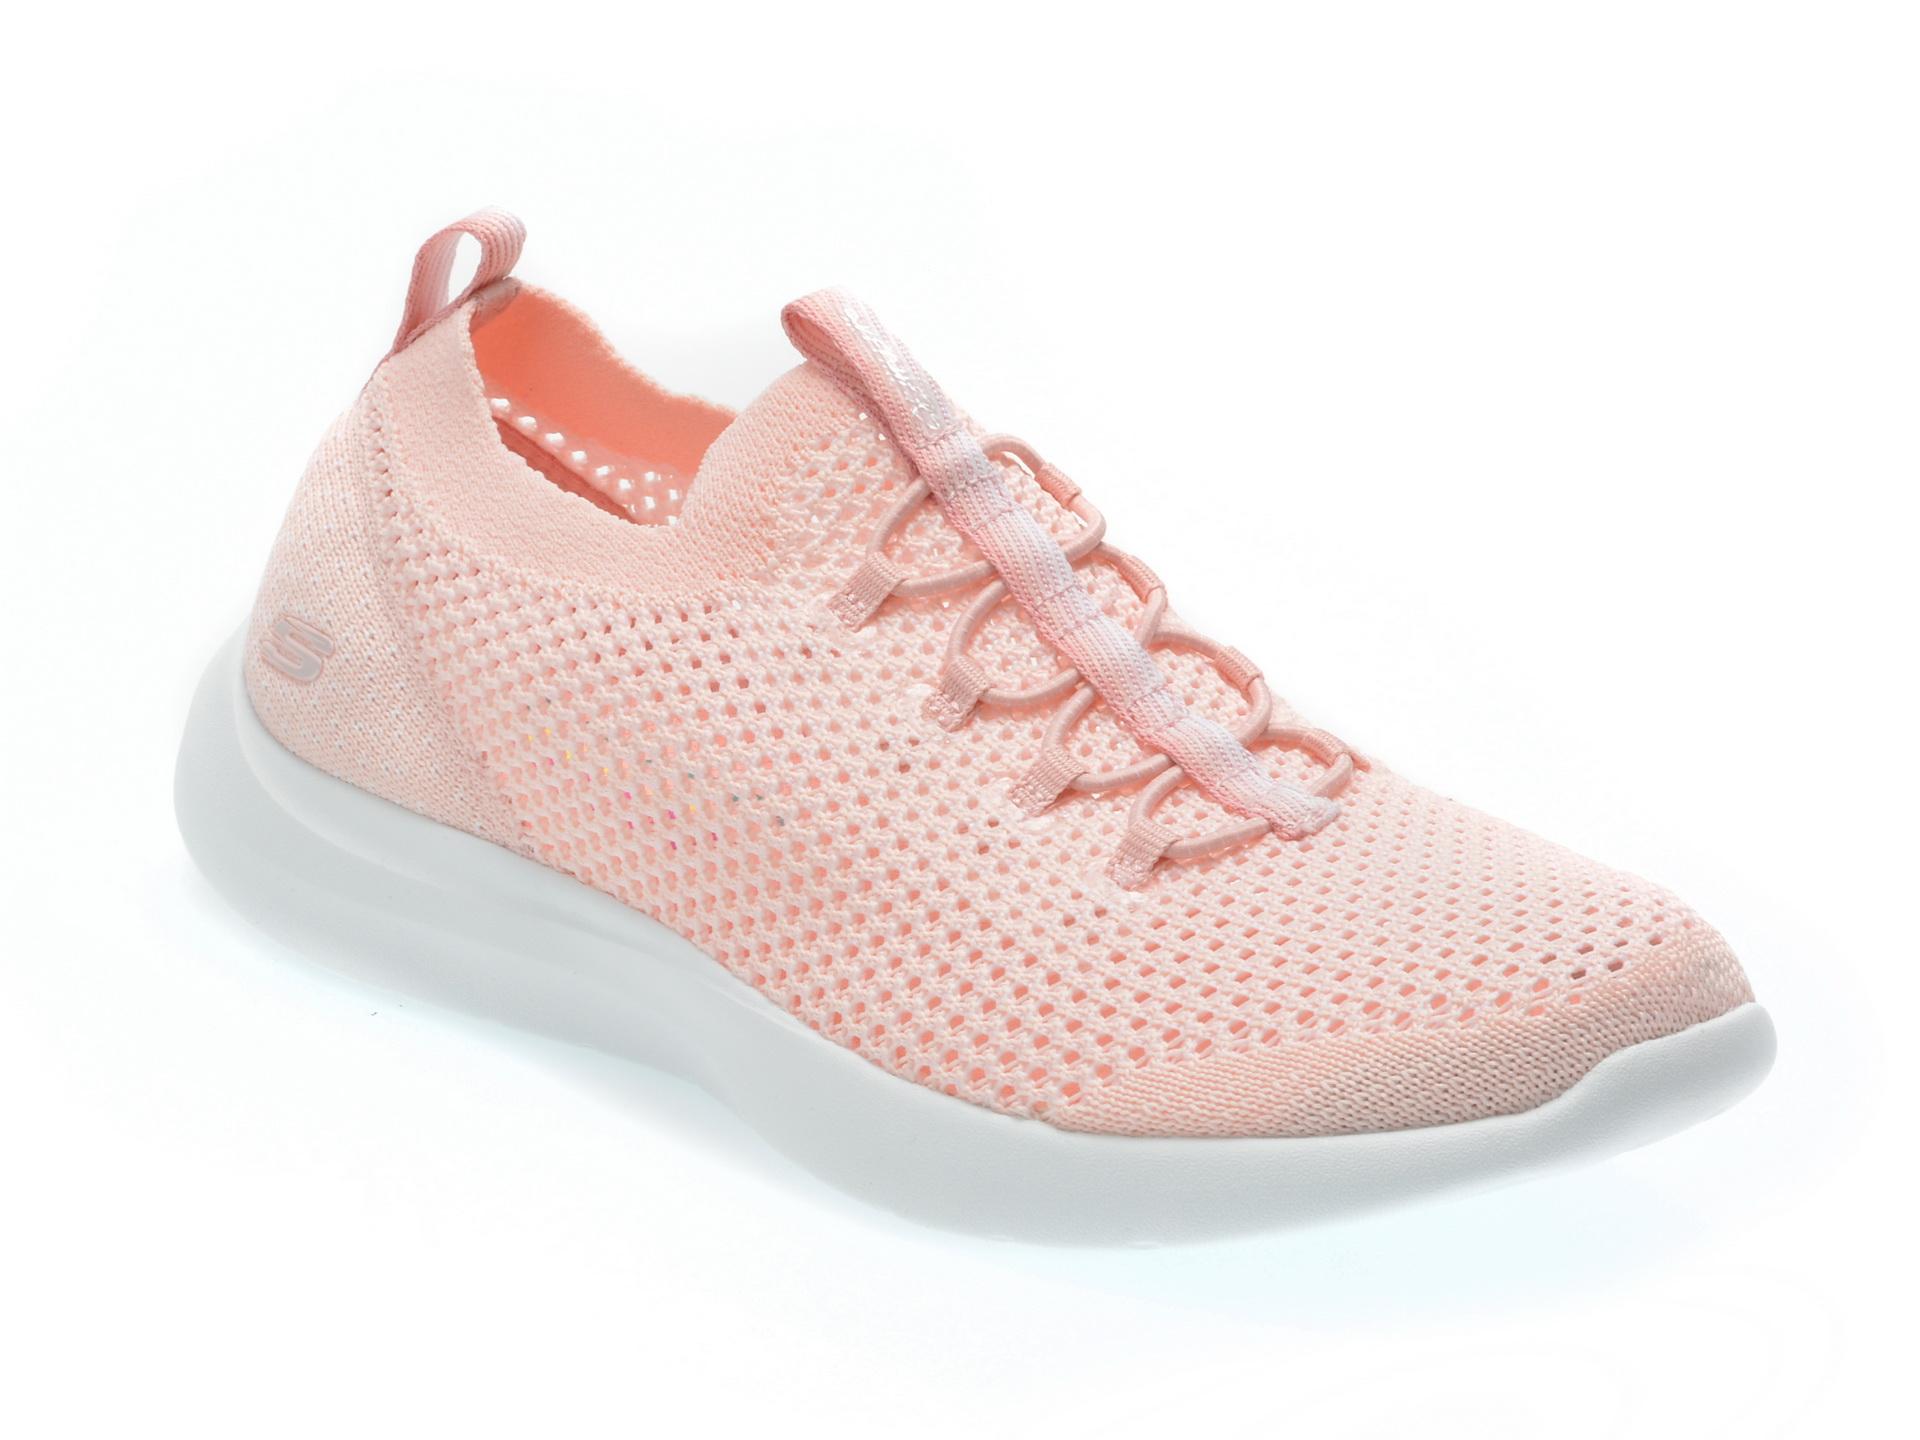 Pantofi sport SKECHERS roz, 12881, din material textil